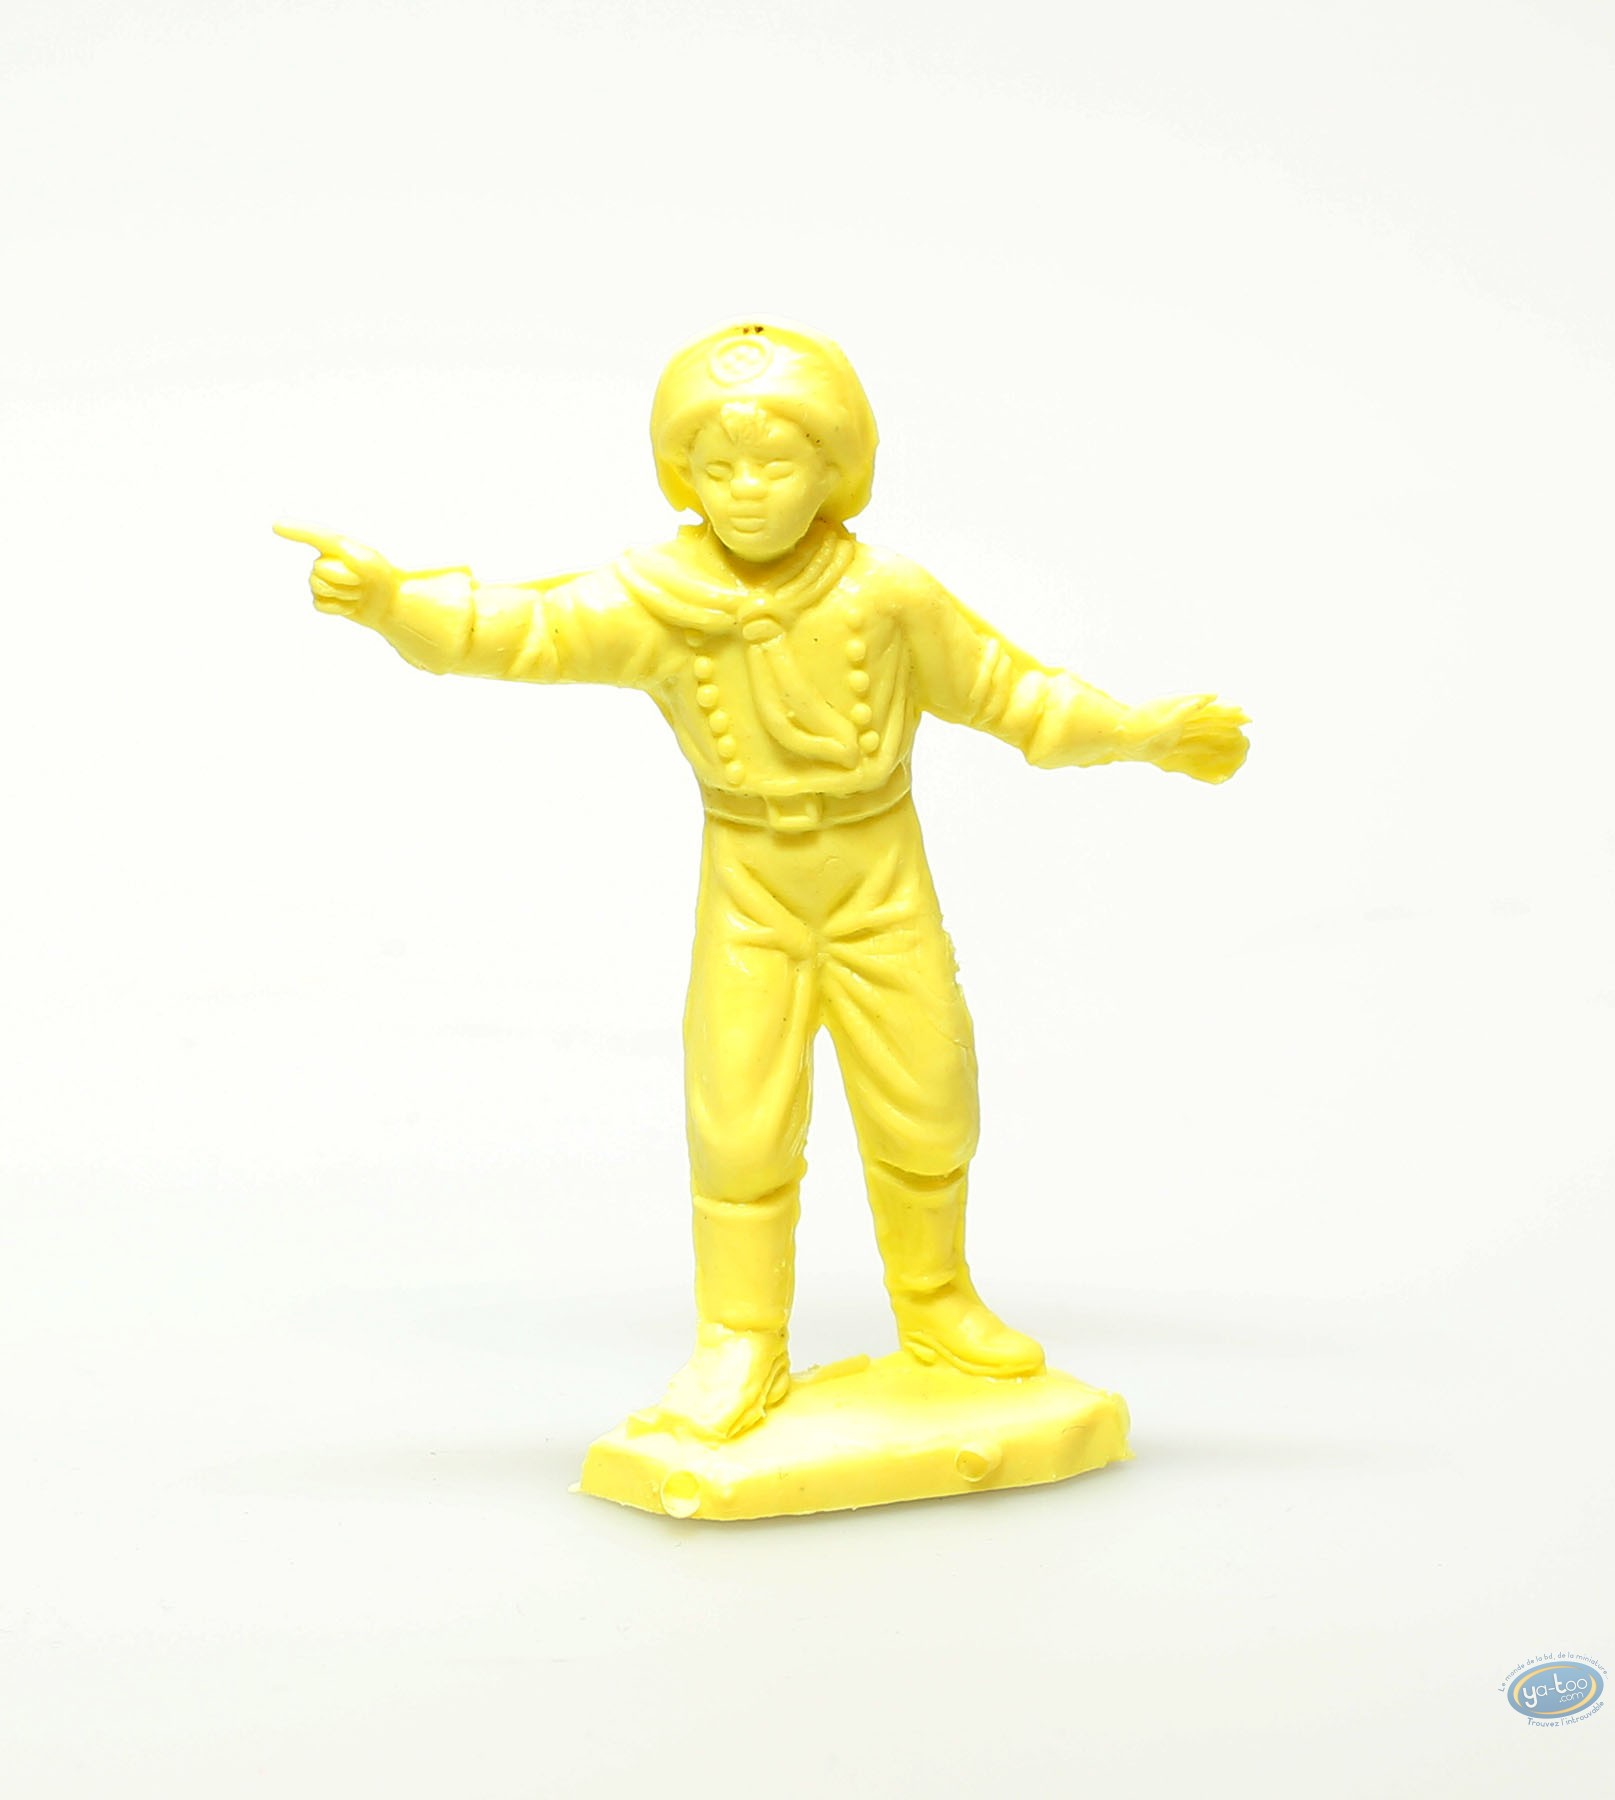 Figurine plastique, Rintintin : Rusty jaune montrant du doigt